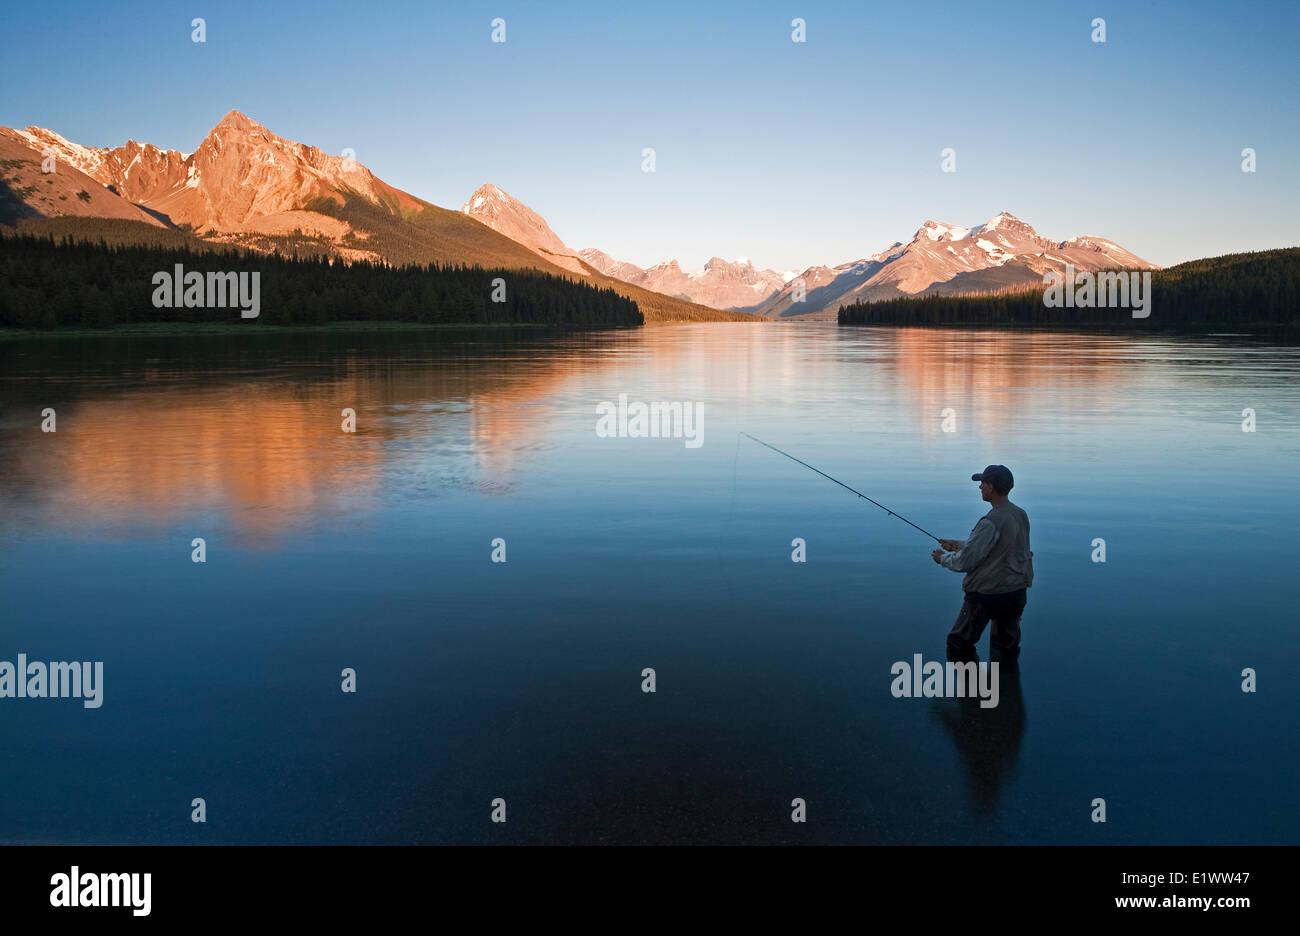 Middle age male fly fishing on Maligne Lake, Jasper National Park, Alberta, Canada. Stock Photo